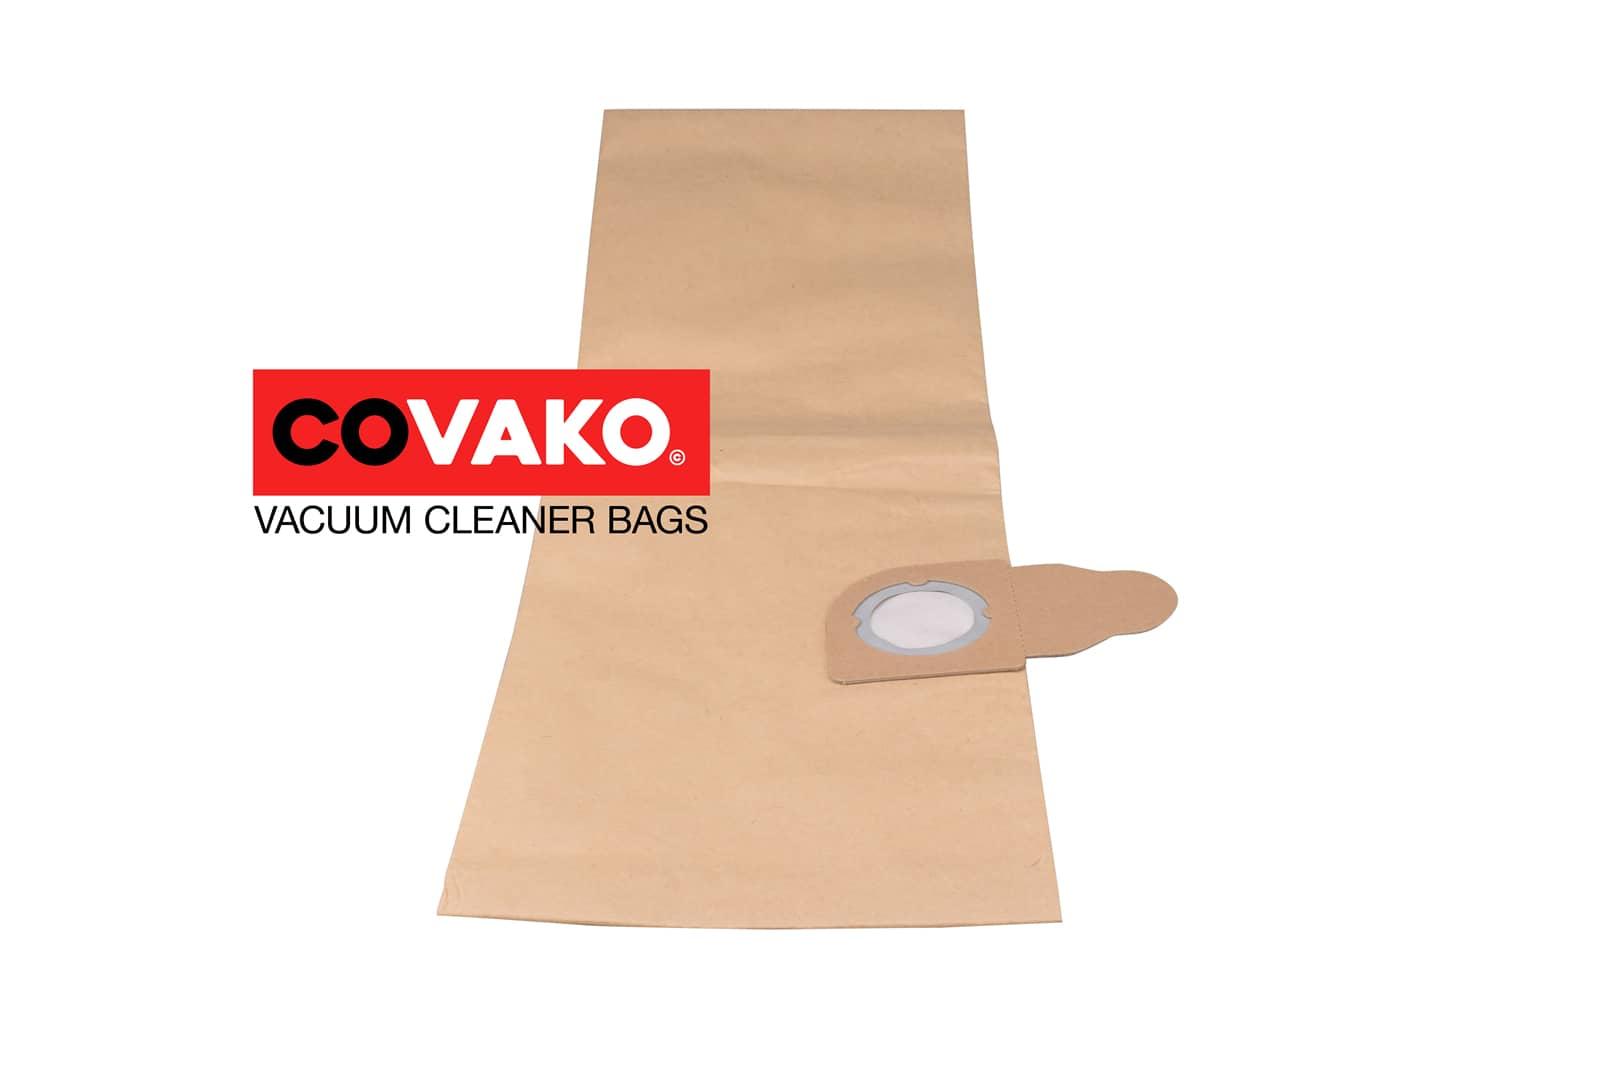 Wap Aero 640 / Papier - Wap sacs d'aspirateur